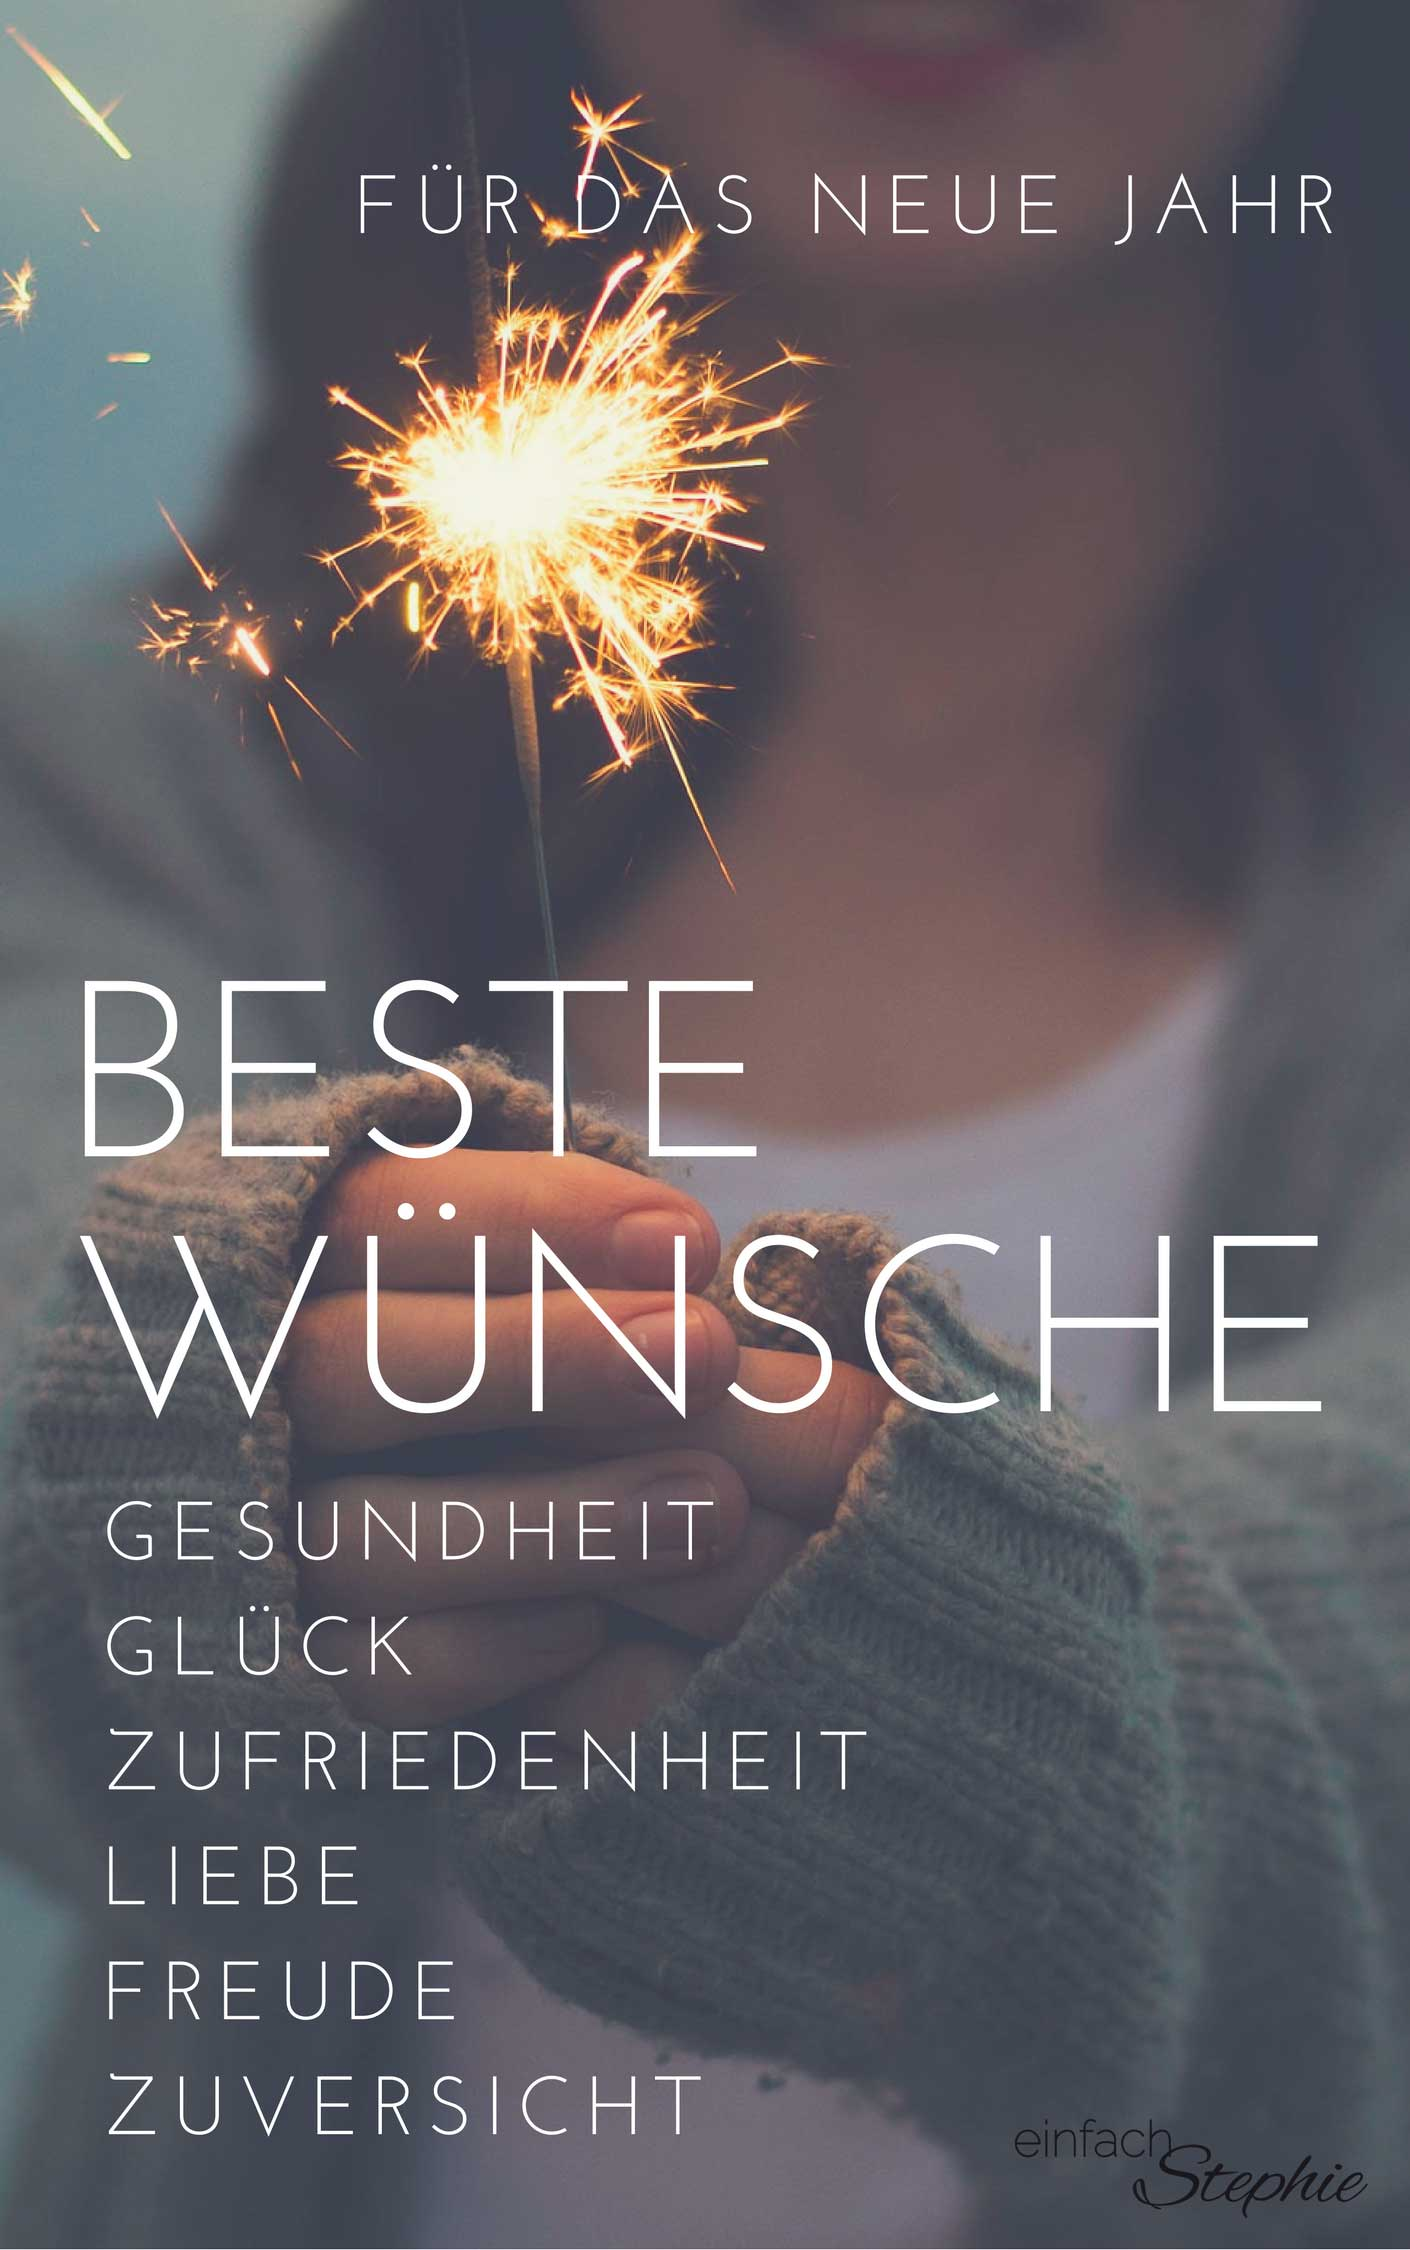 Silvestergrüße Whatsapp 2018/19. Kostenloser Download